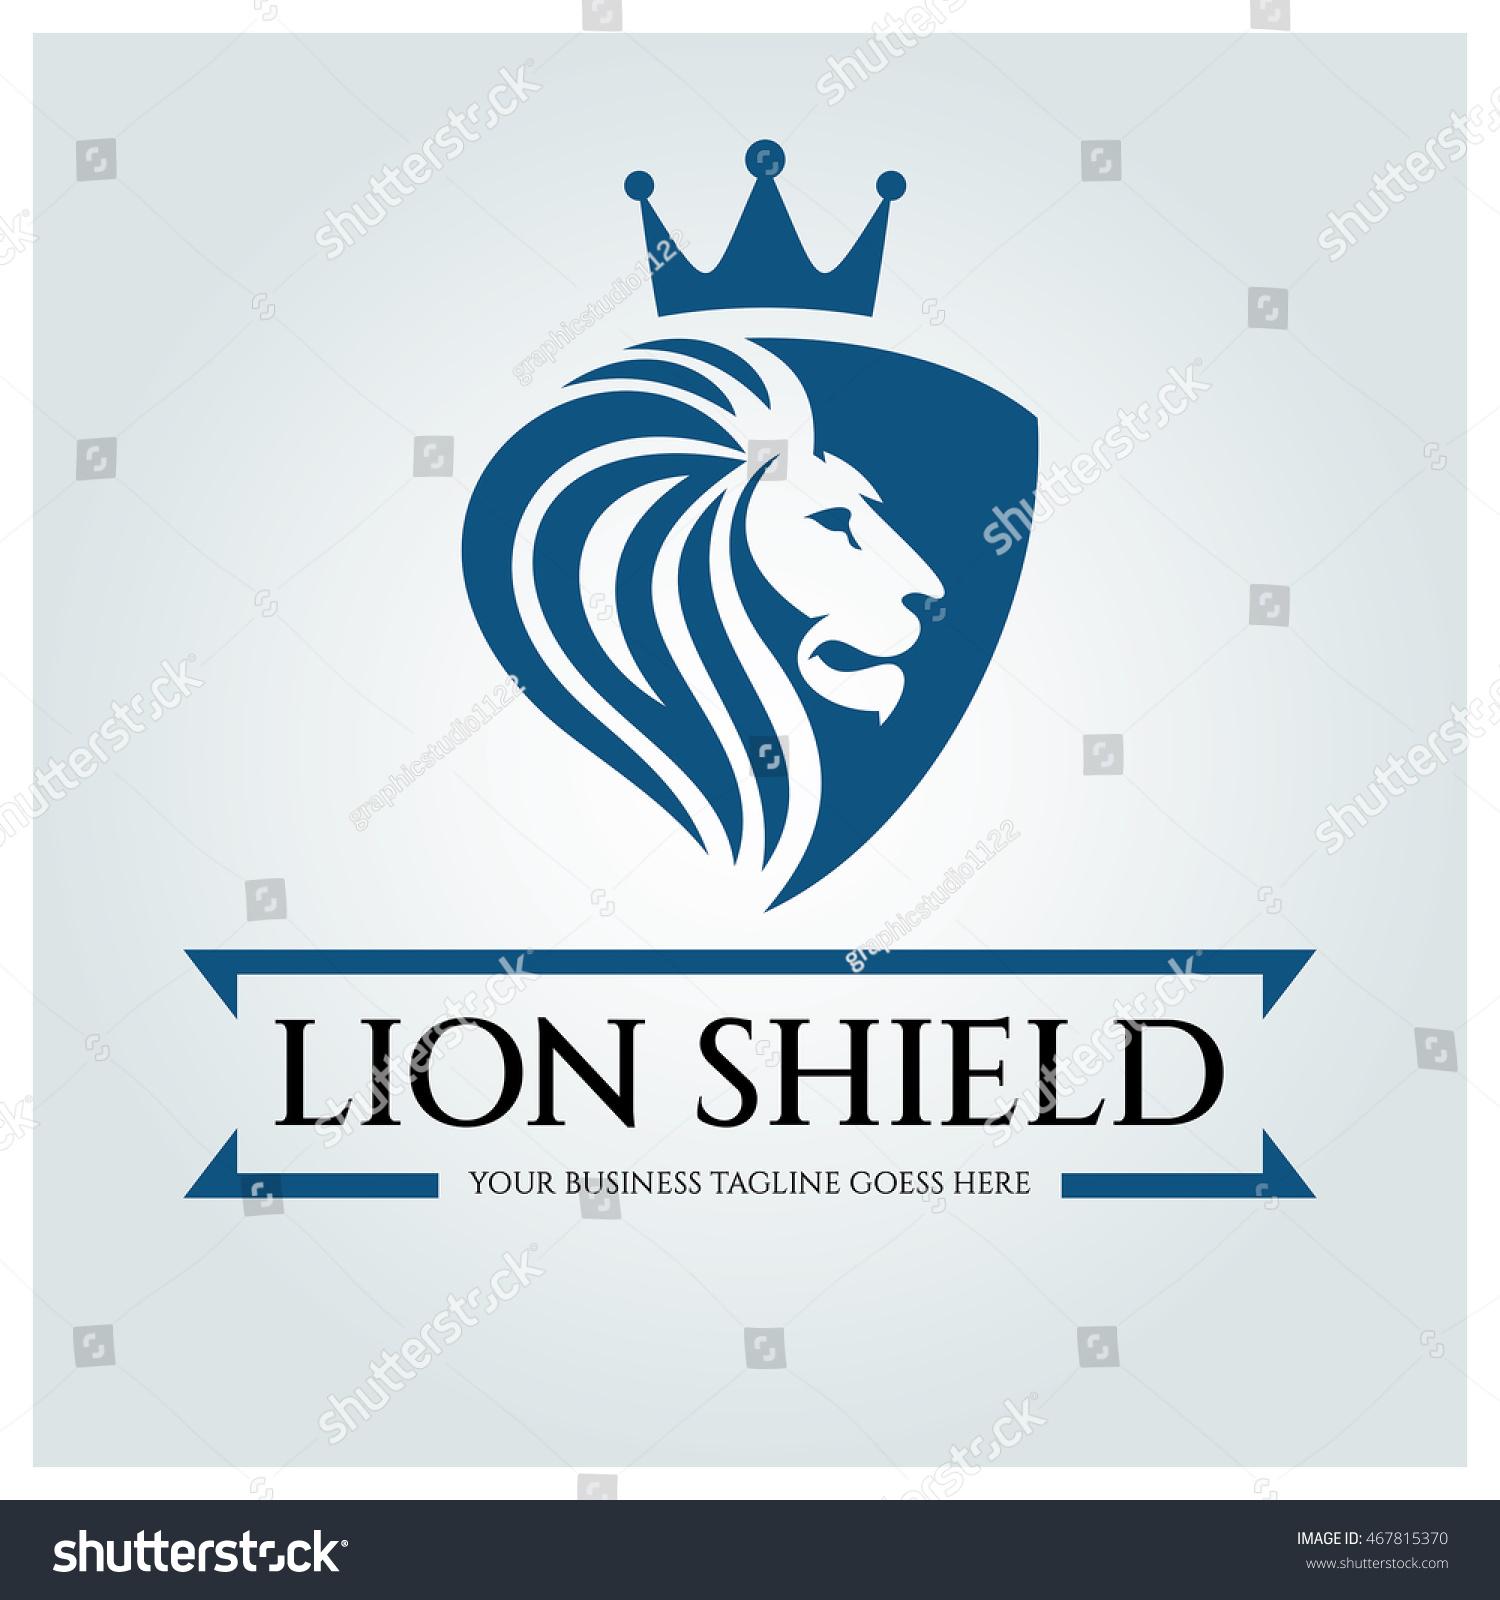 lion shield logo design template business stock vector